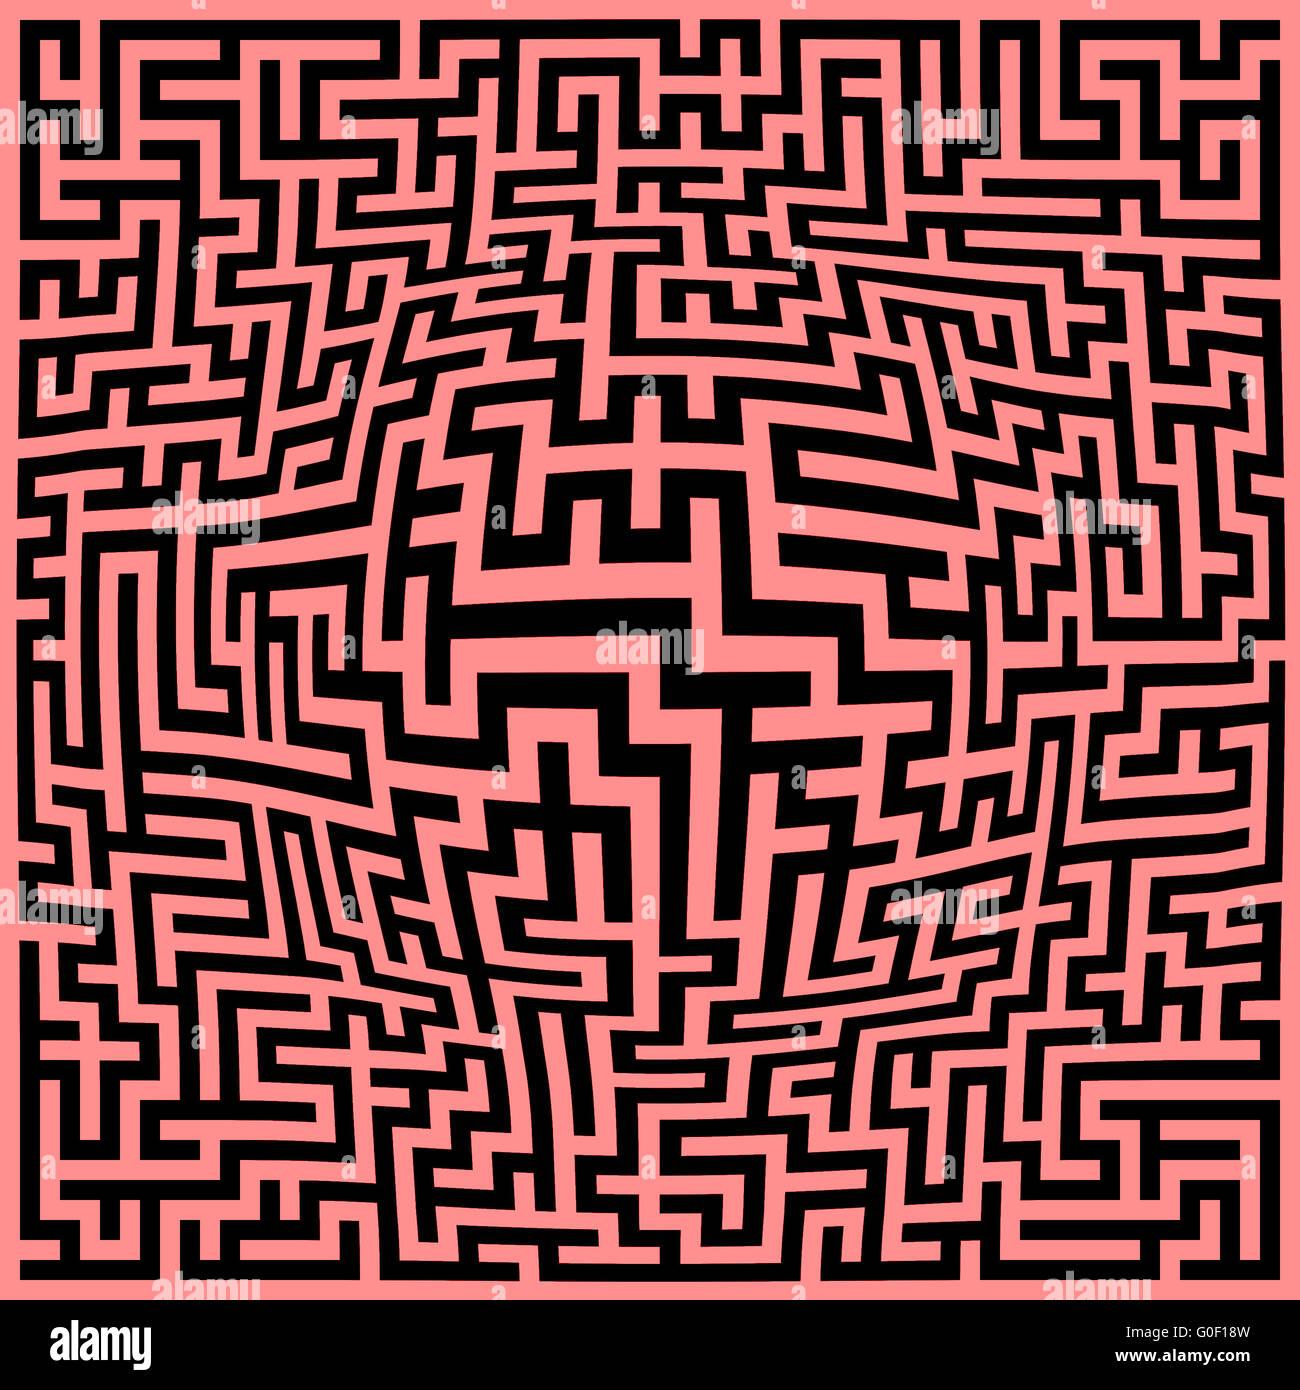 Labyrinth maze background - Stock Image